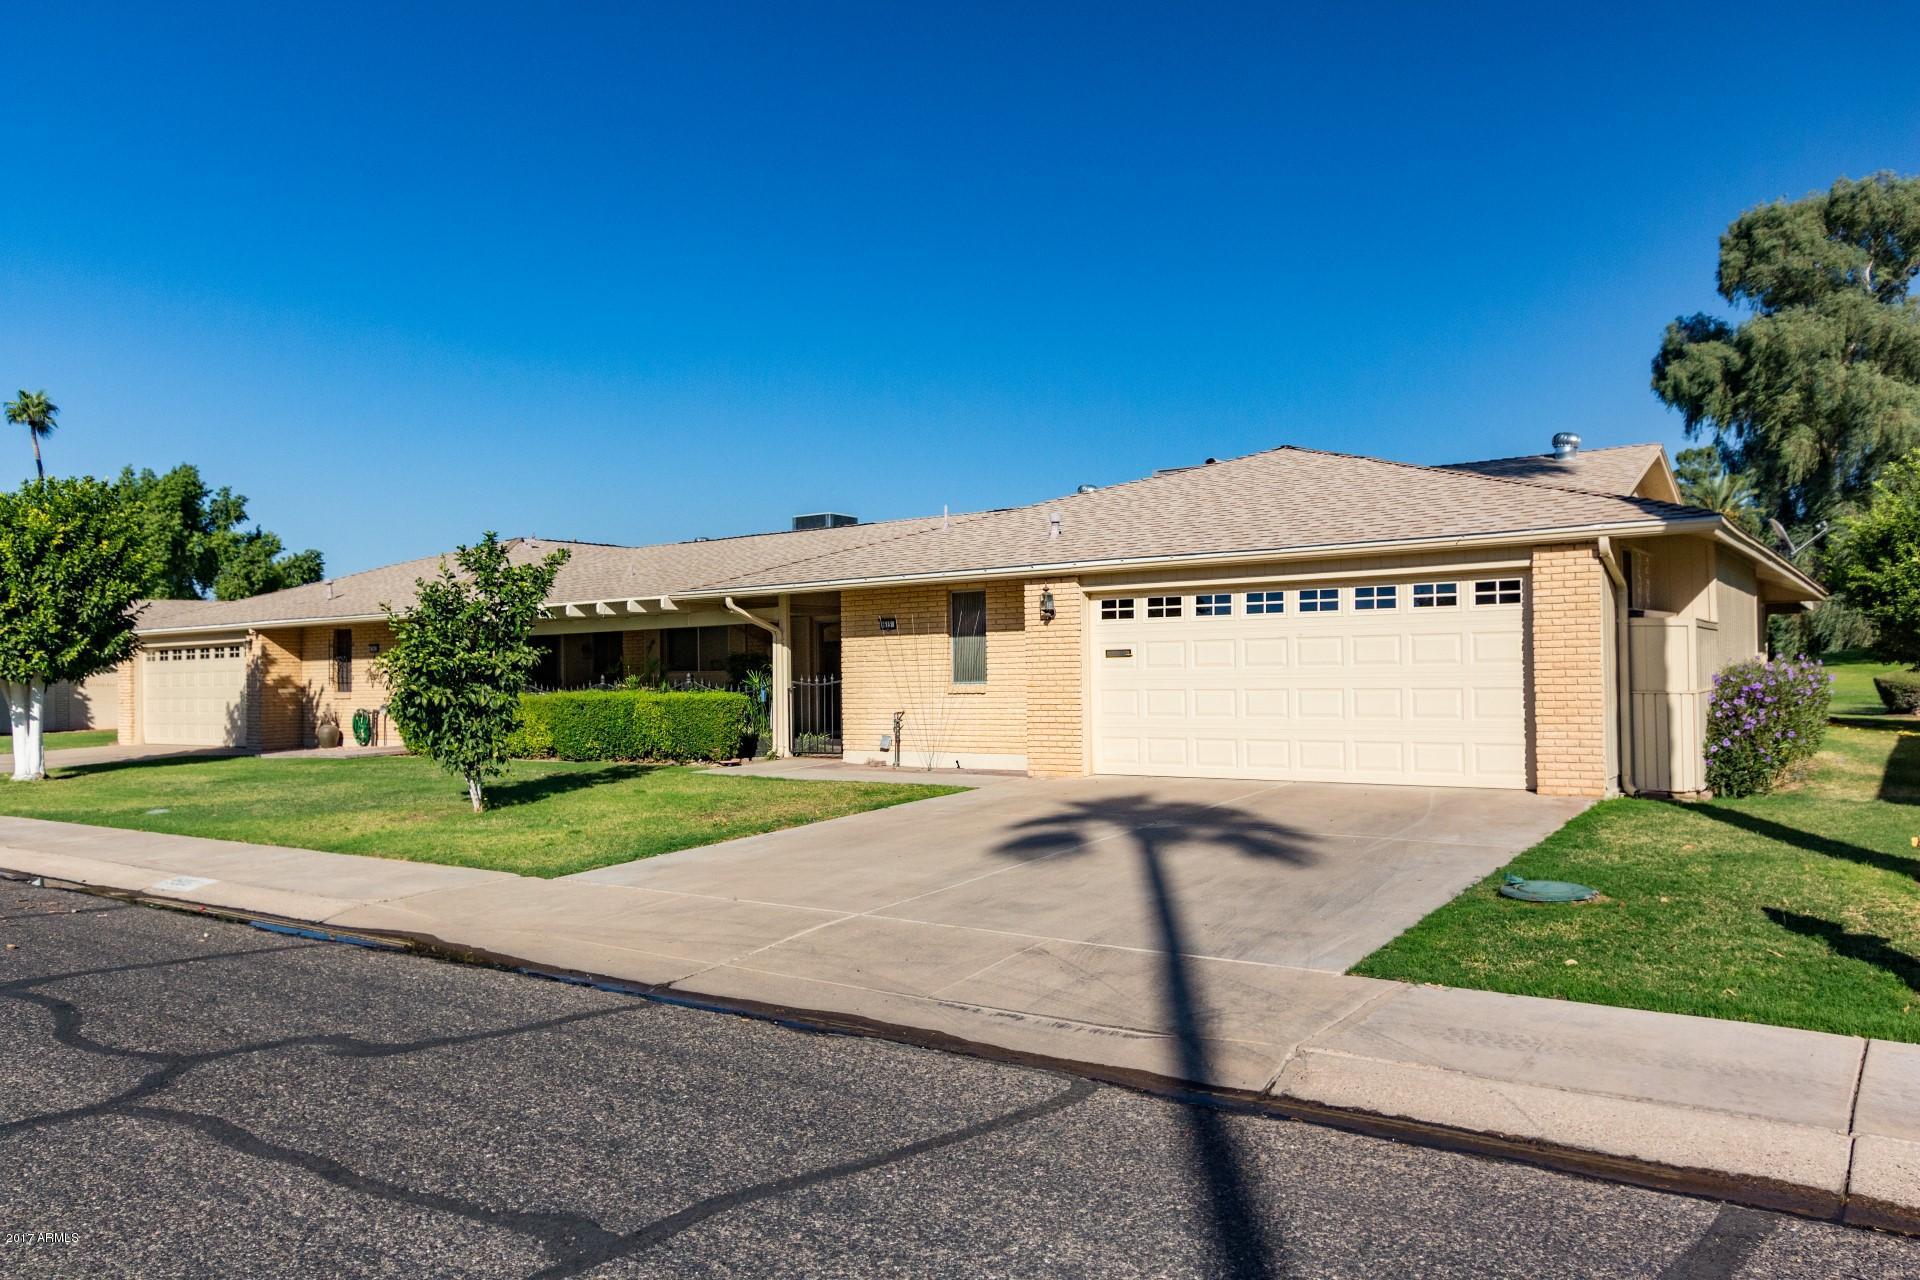 Photo for 9615 N 110th Avenue, Sun City, AZ 85351 (MLS # 5680276)